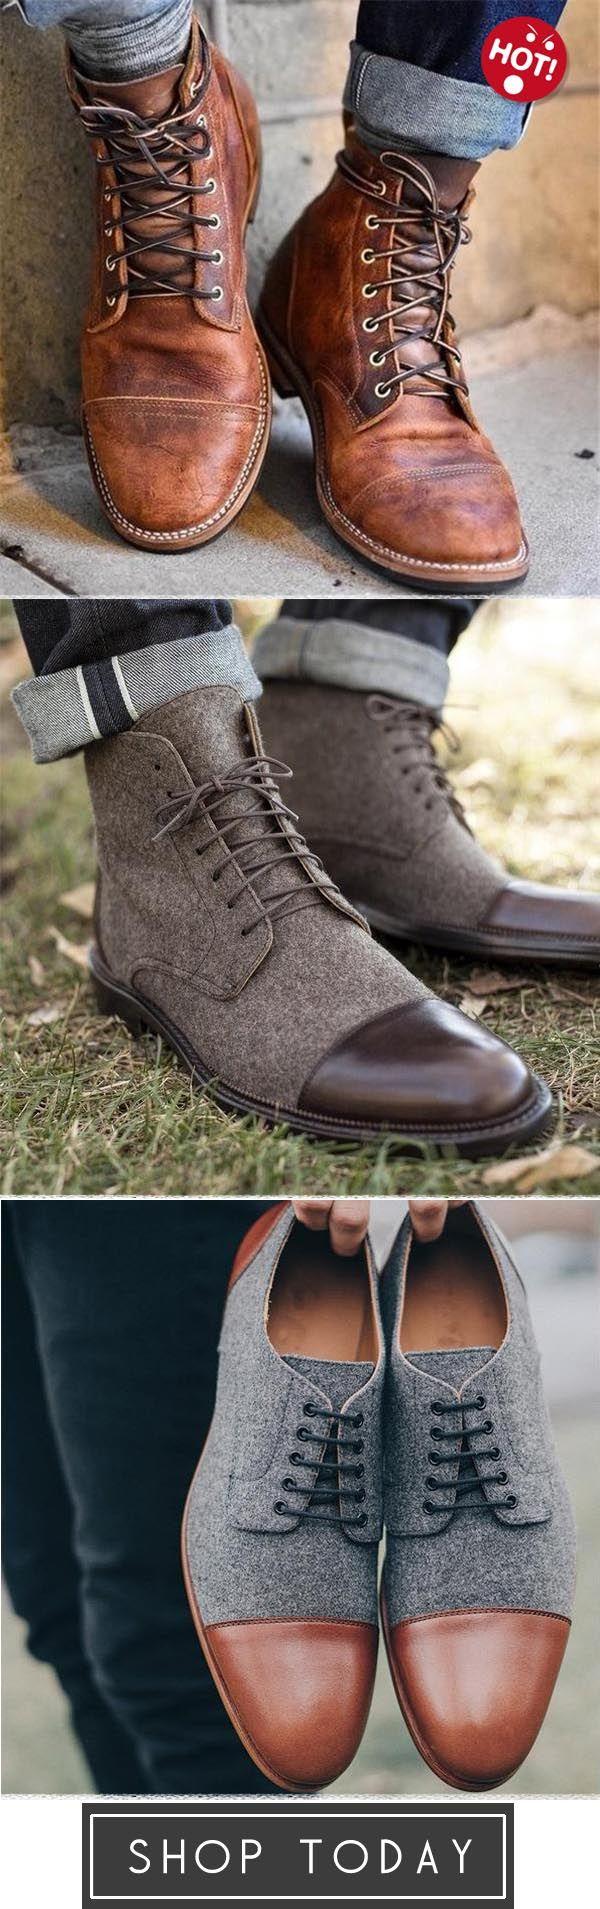 Ankle 's Boots Business casual Men Vintage Leather VqSGpUzM